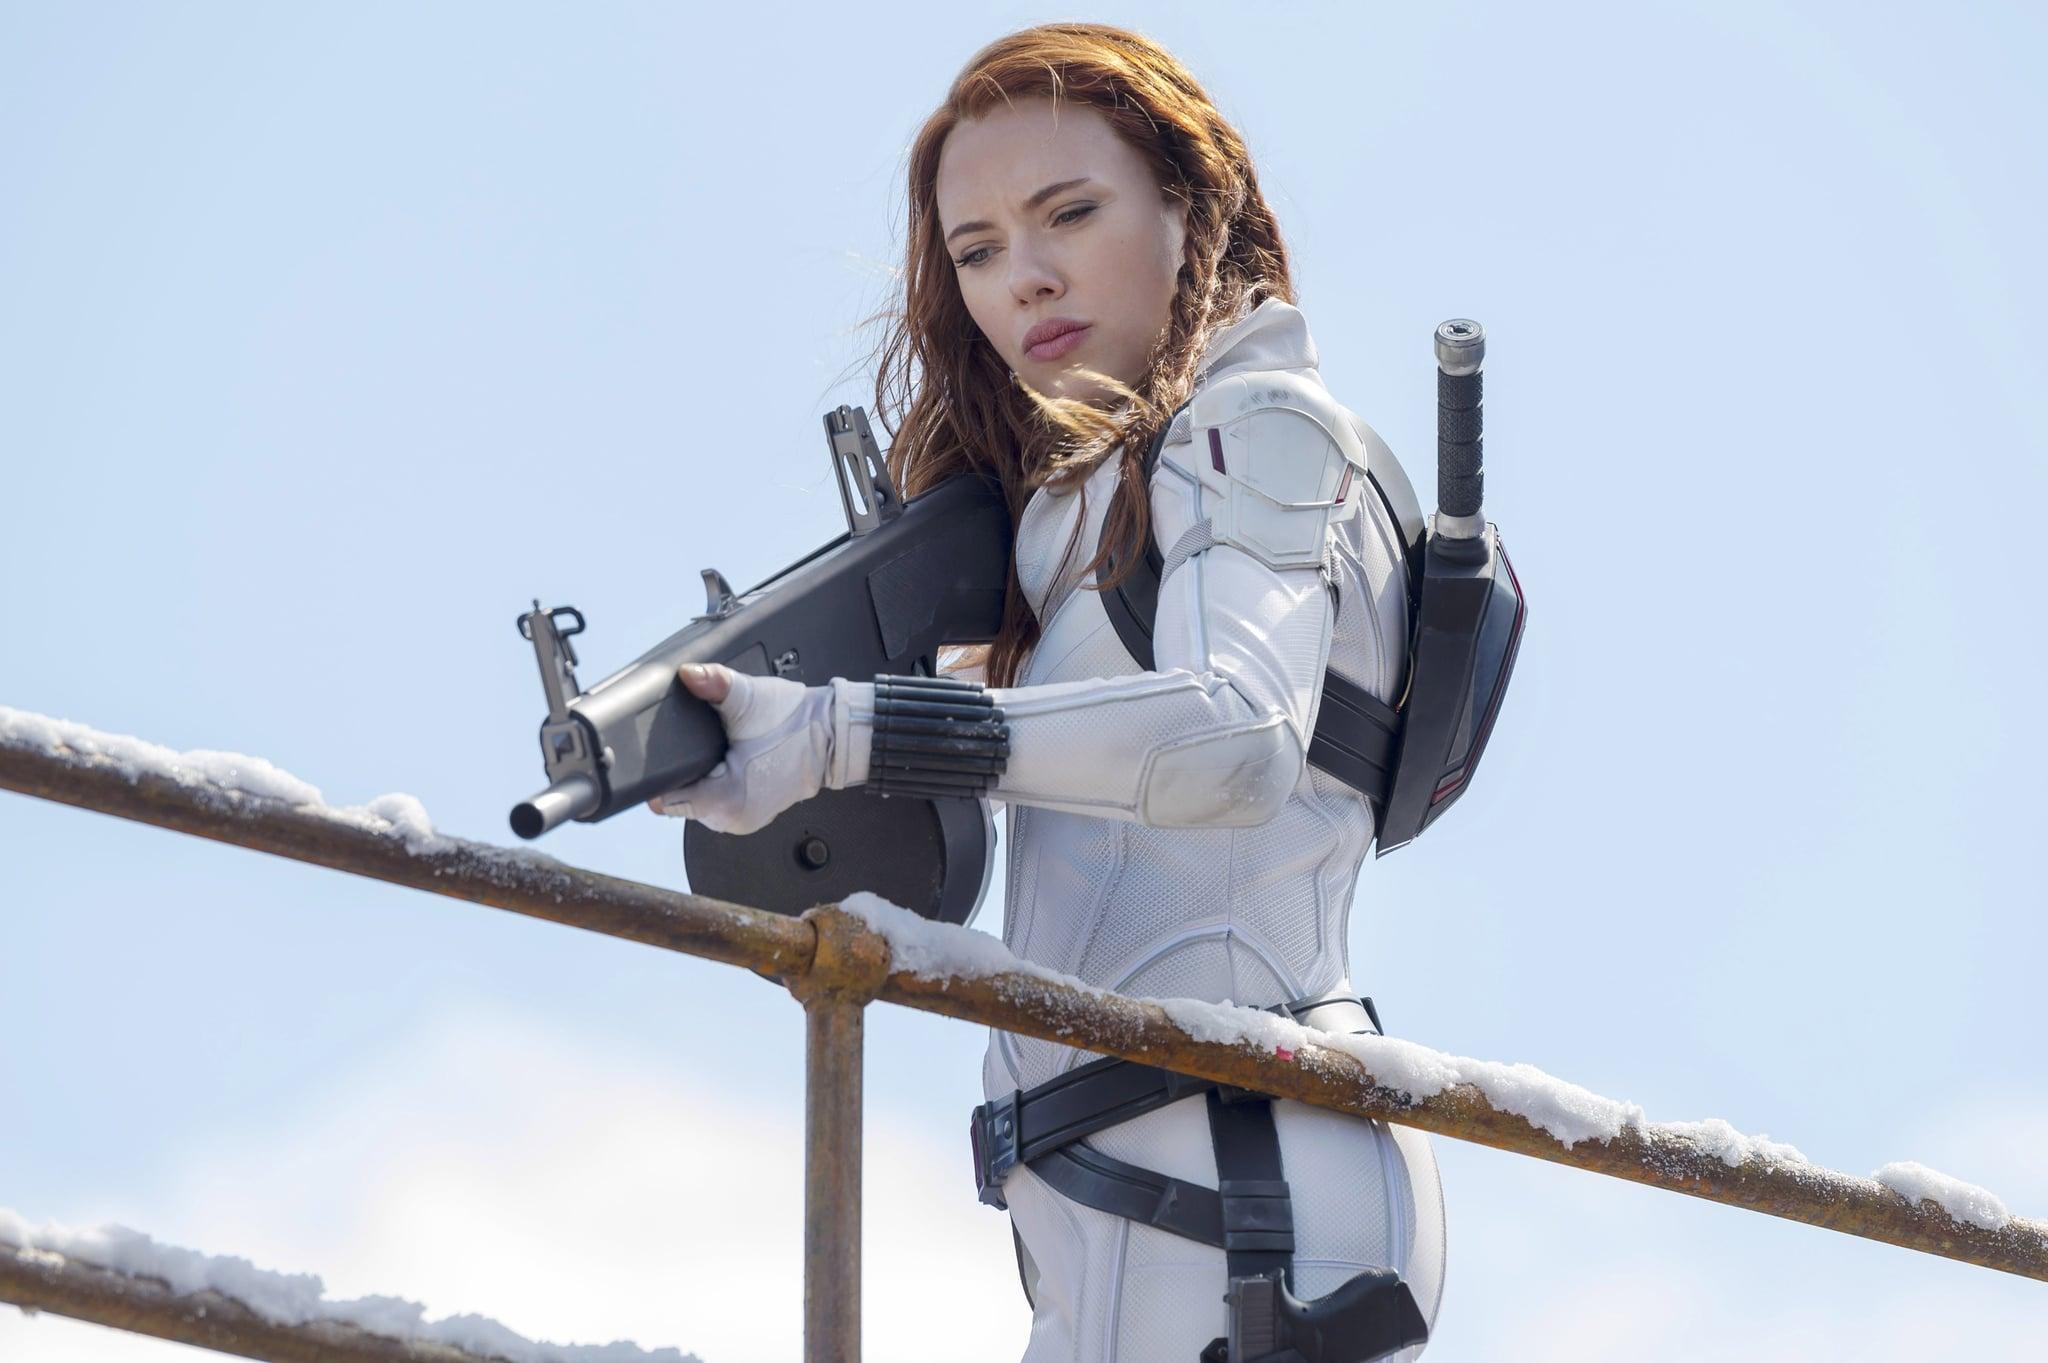 BLACK WIDOW, Scarlett Johansson as Black Widow, 2021.  ph: Jay Maidment / Walt Disney Studios Motion Pictures /  Marvel Studios / Courtesy Everett Collection